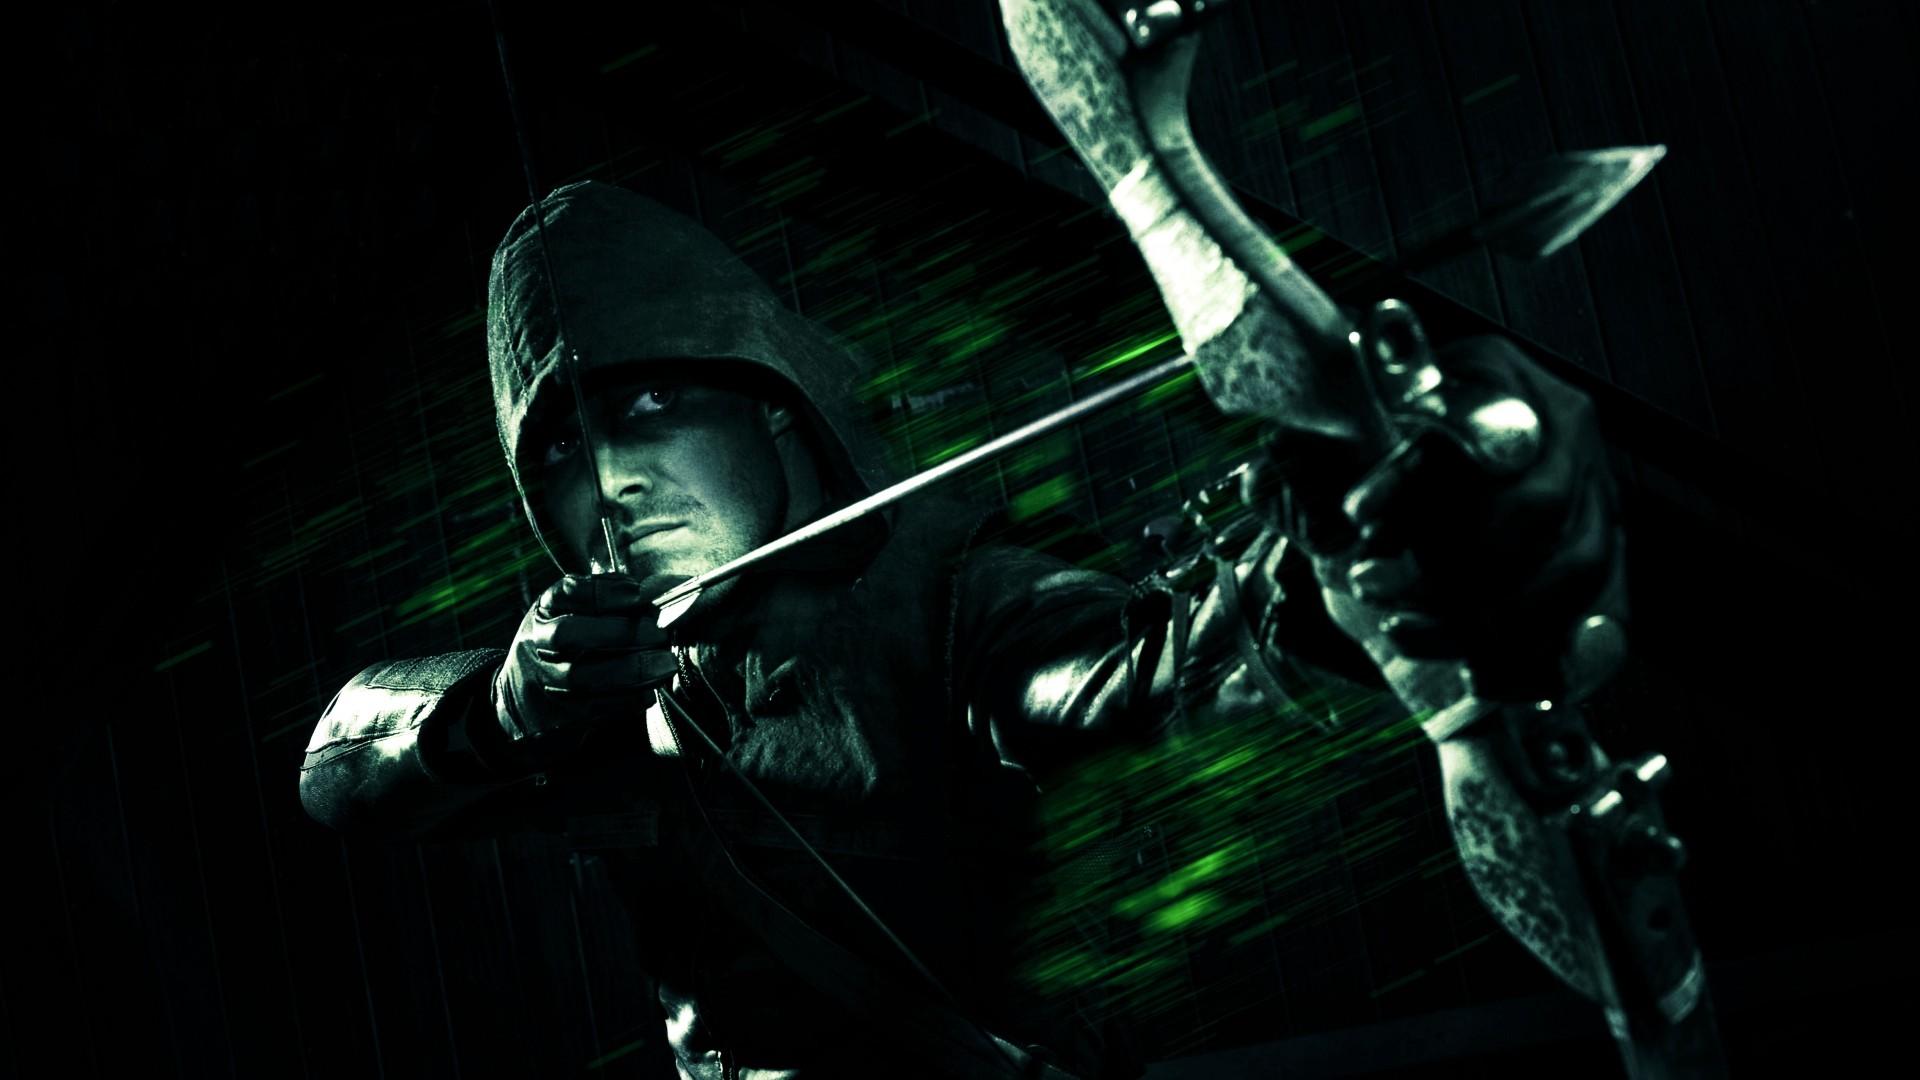 Harry Potter Wallpapers Hd For Desktop Green Arrow 5k Wallpapers Hd Wallpapers Id 25330